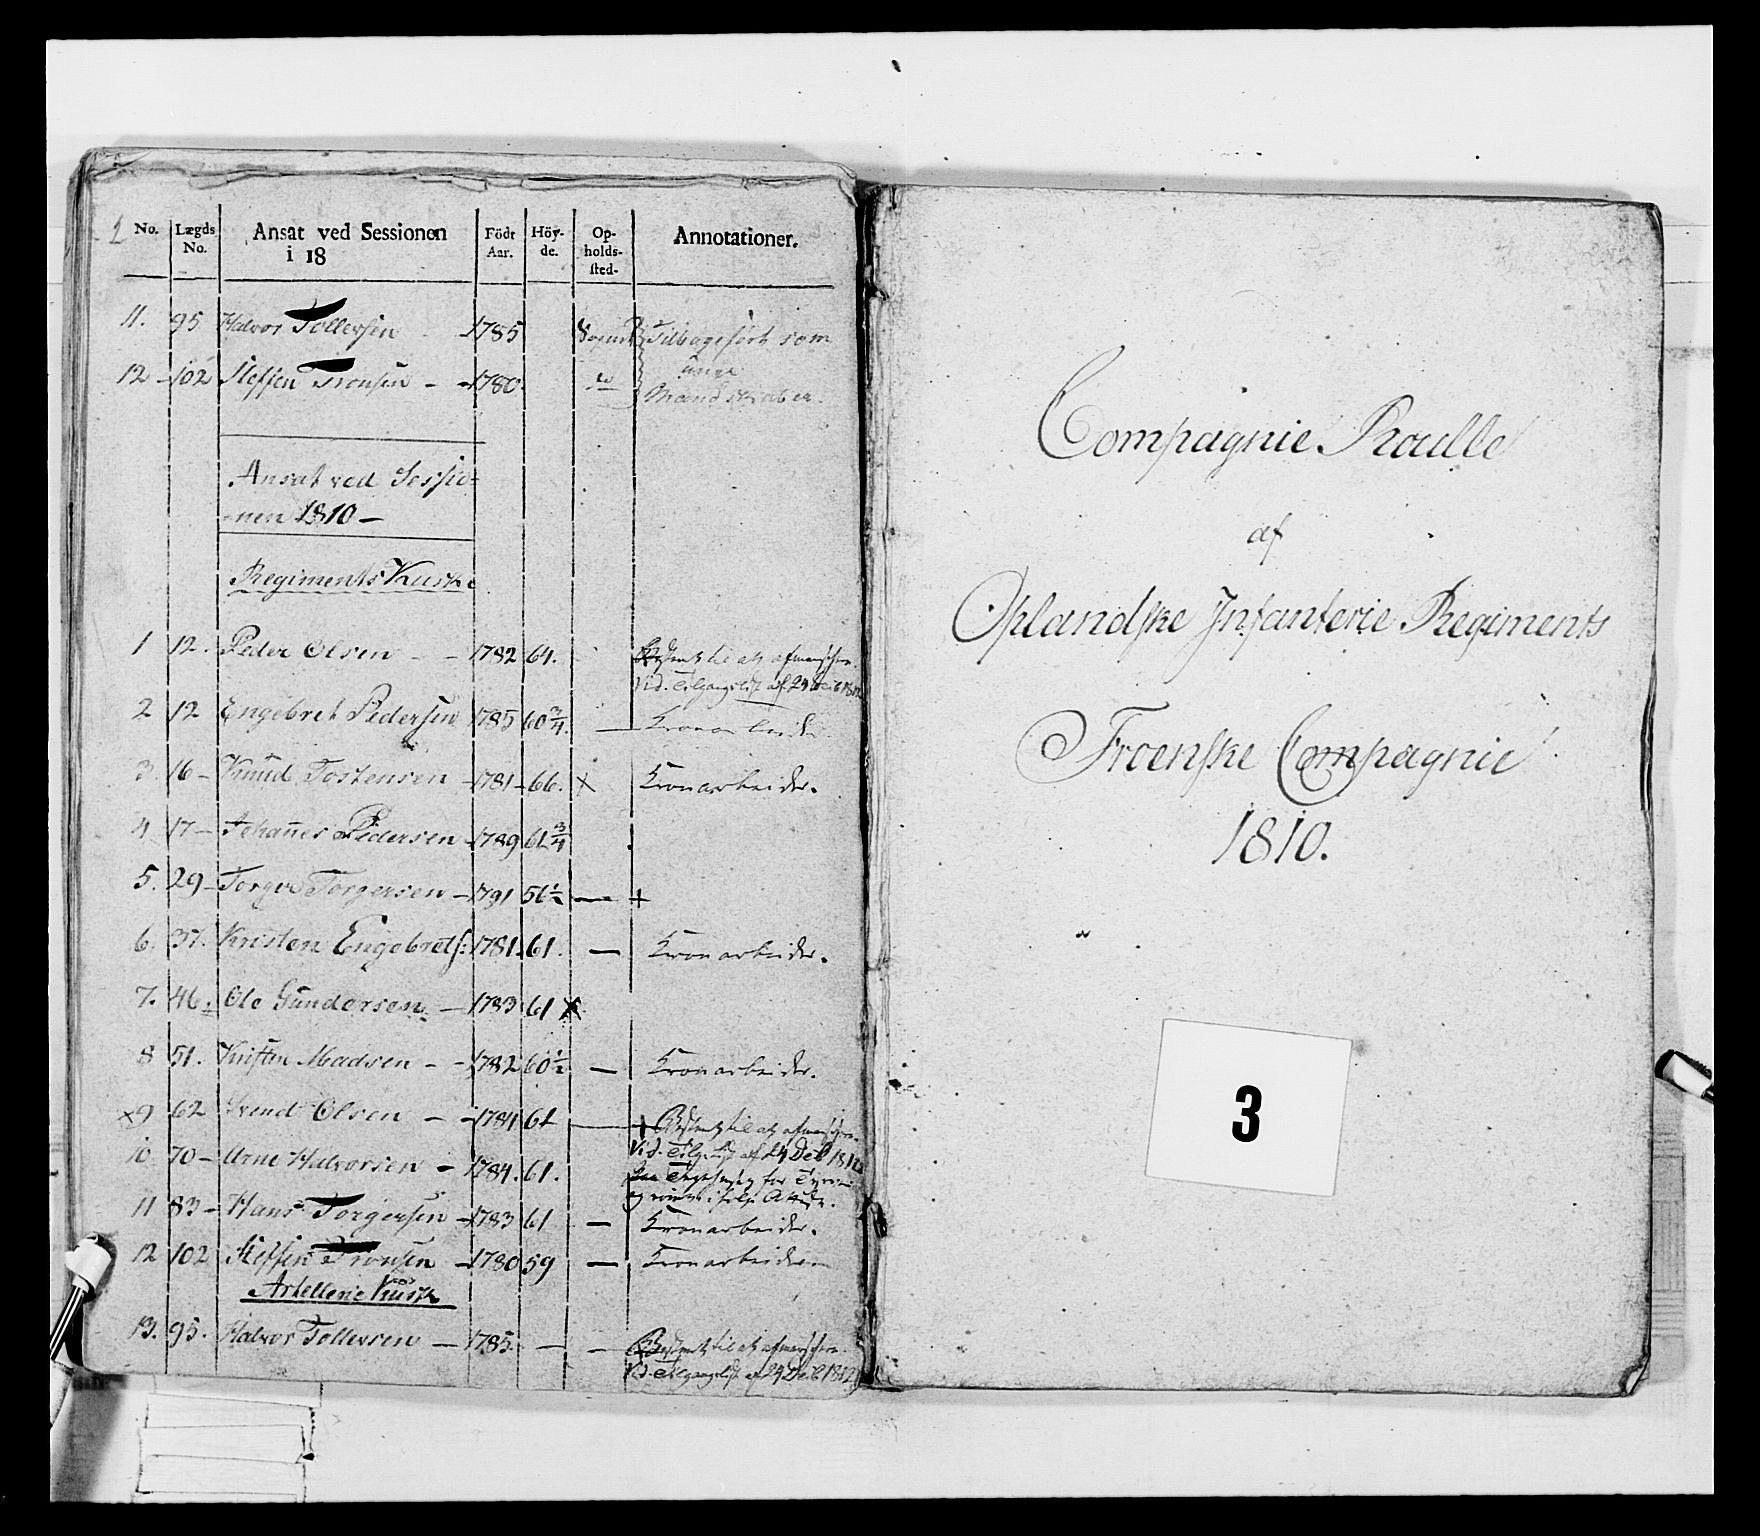 RA, Generalitets- og kommissariatskollegiet, Det kongelige norske kommissariatskollegium, E/Eh/L0069: Opplandske gevorbne infanteriregiment, 1810-1818, s. 106